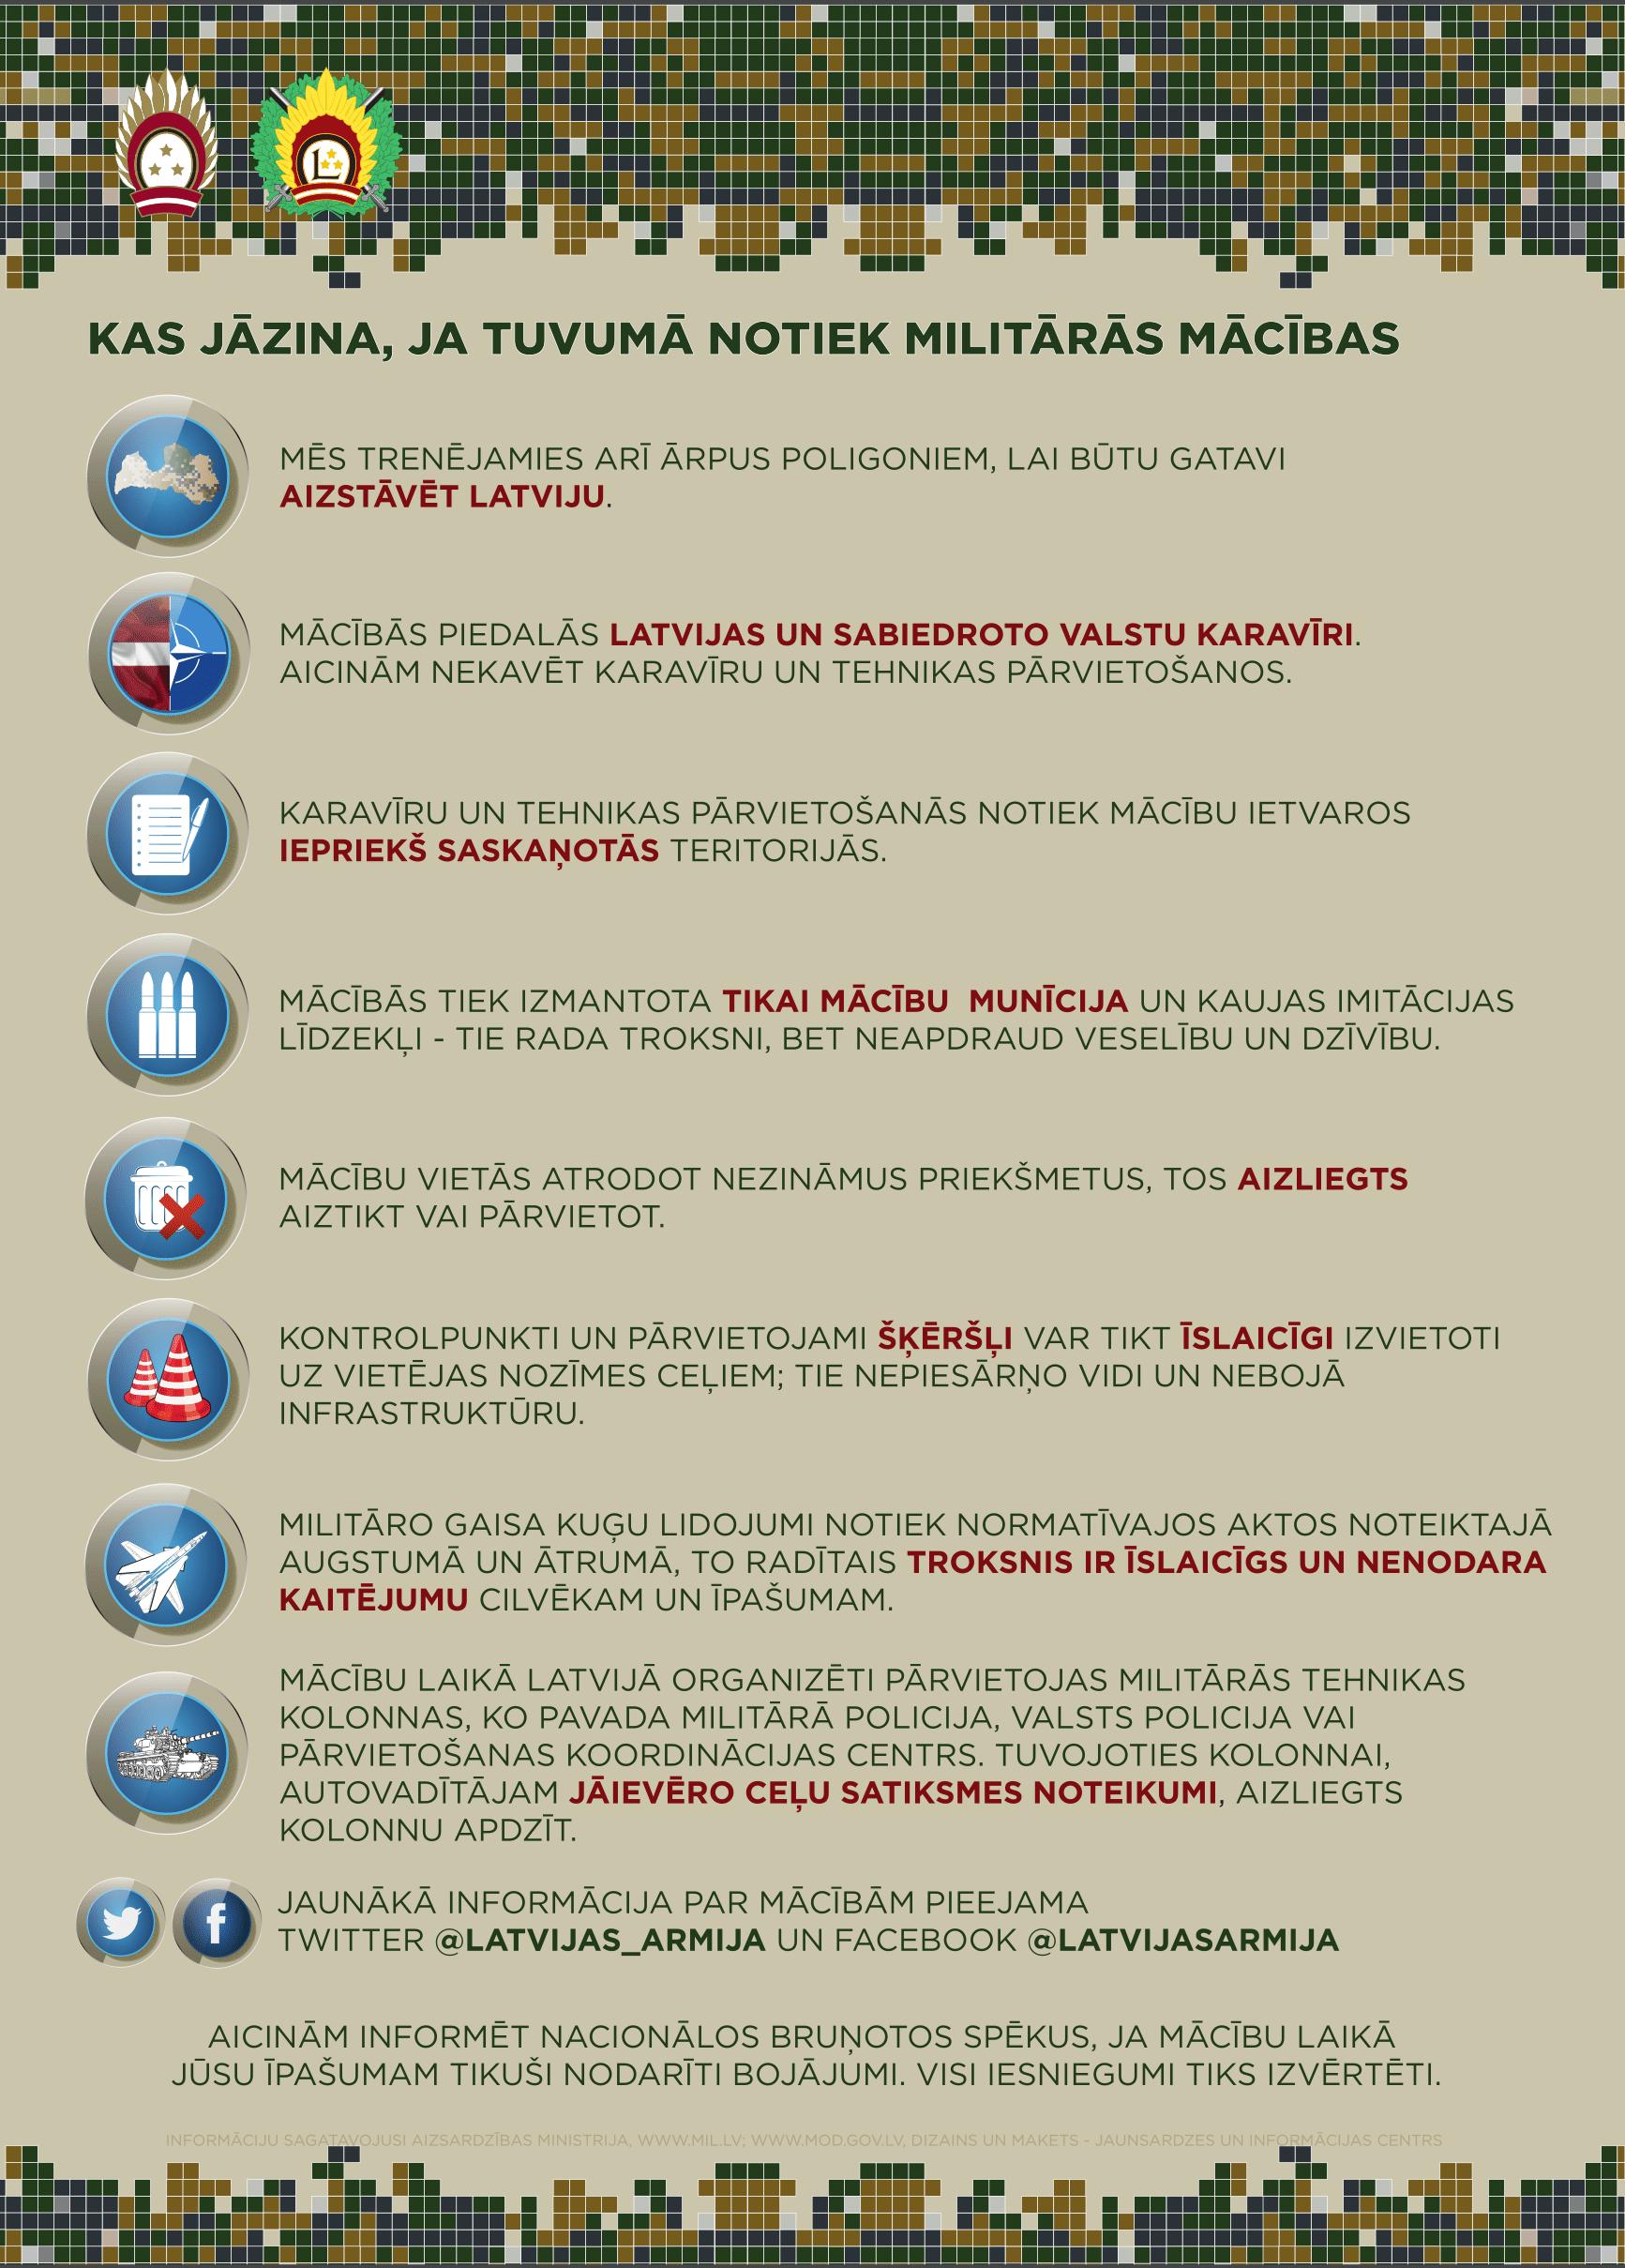 kaarikotiesmilitarasmacibas-1